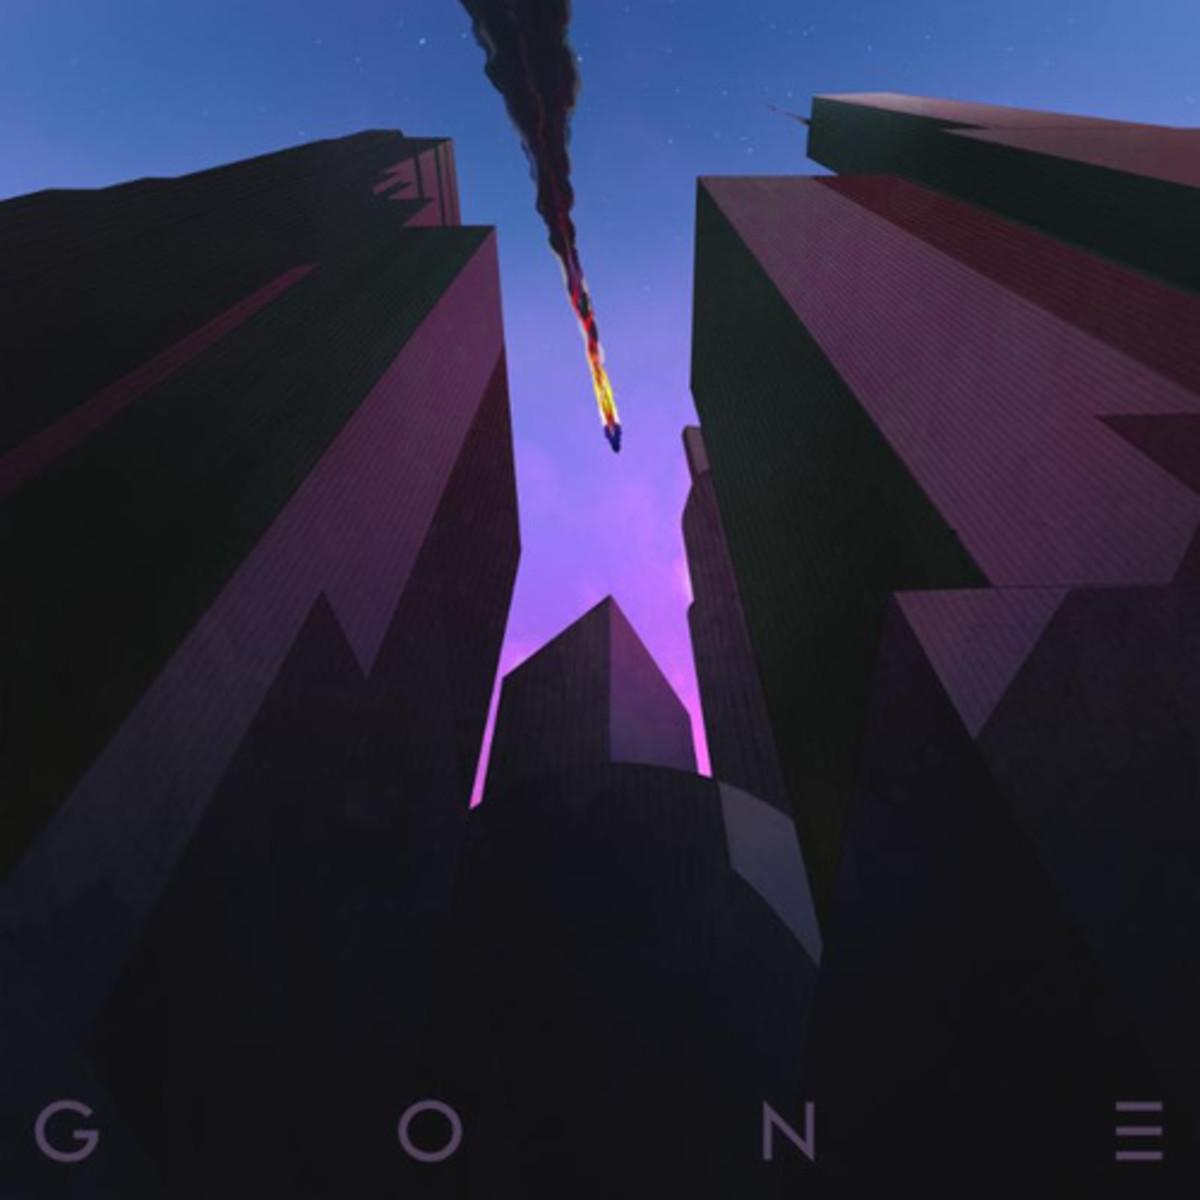 aoe-gone.jpg